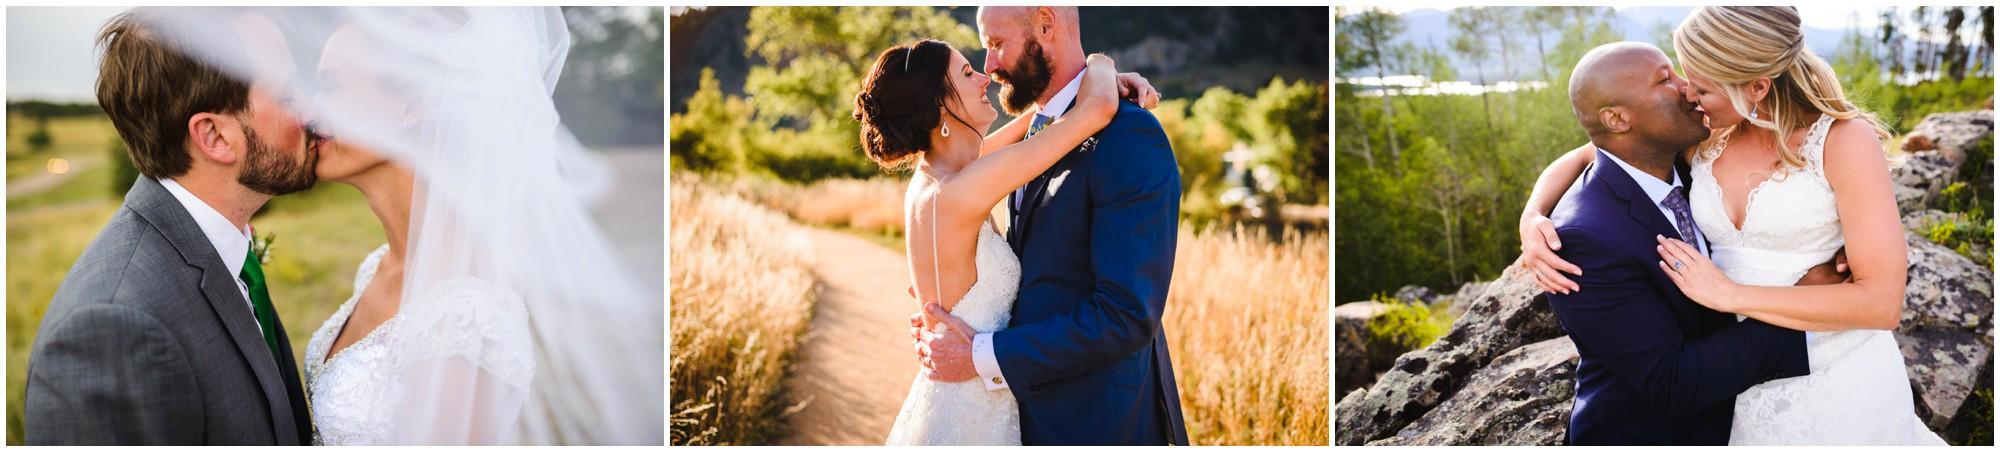 624-Mt.Vernon-Colorado-wedding-photography.jpg